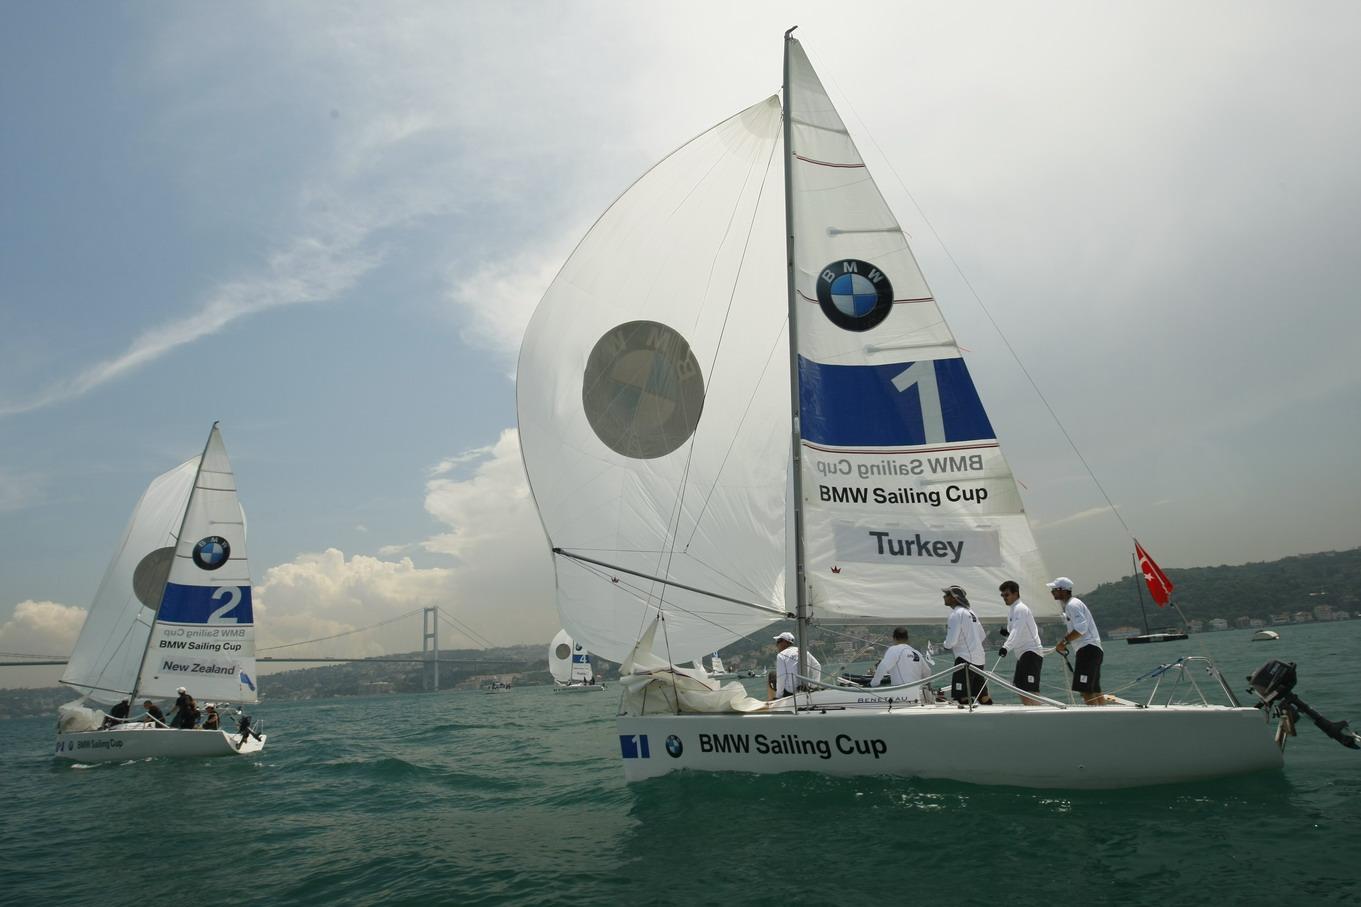 BMW Sailing Cup Uluslararası Finali